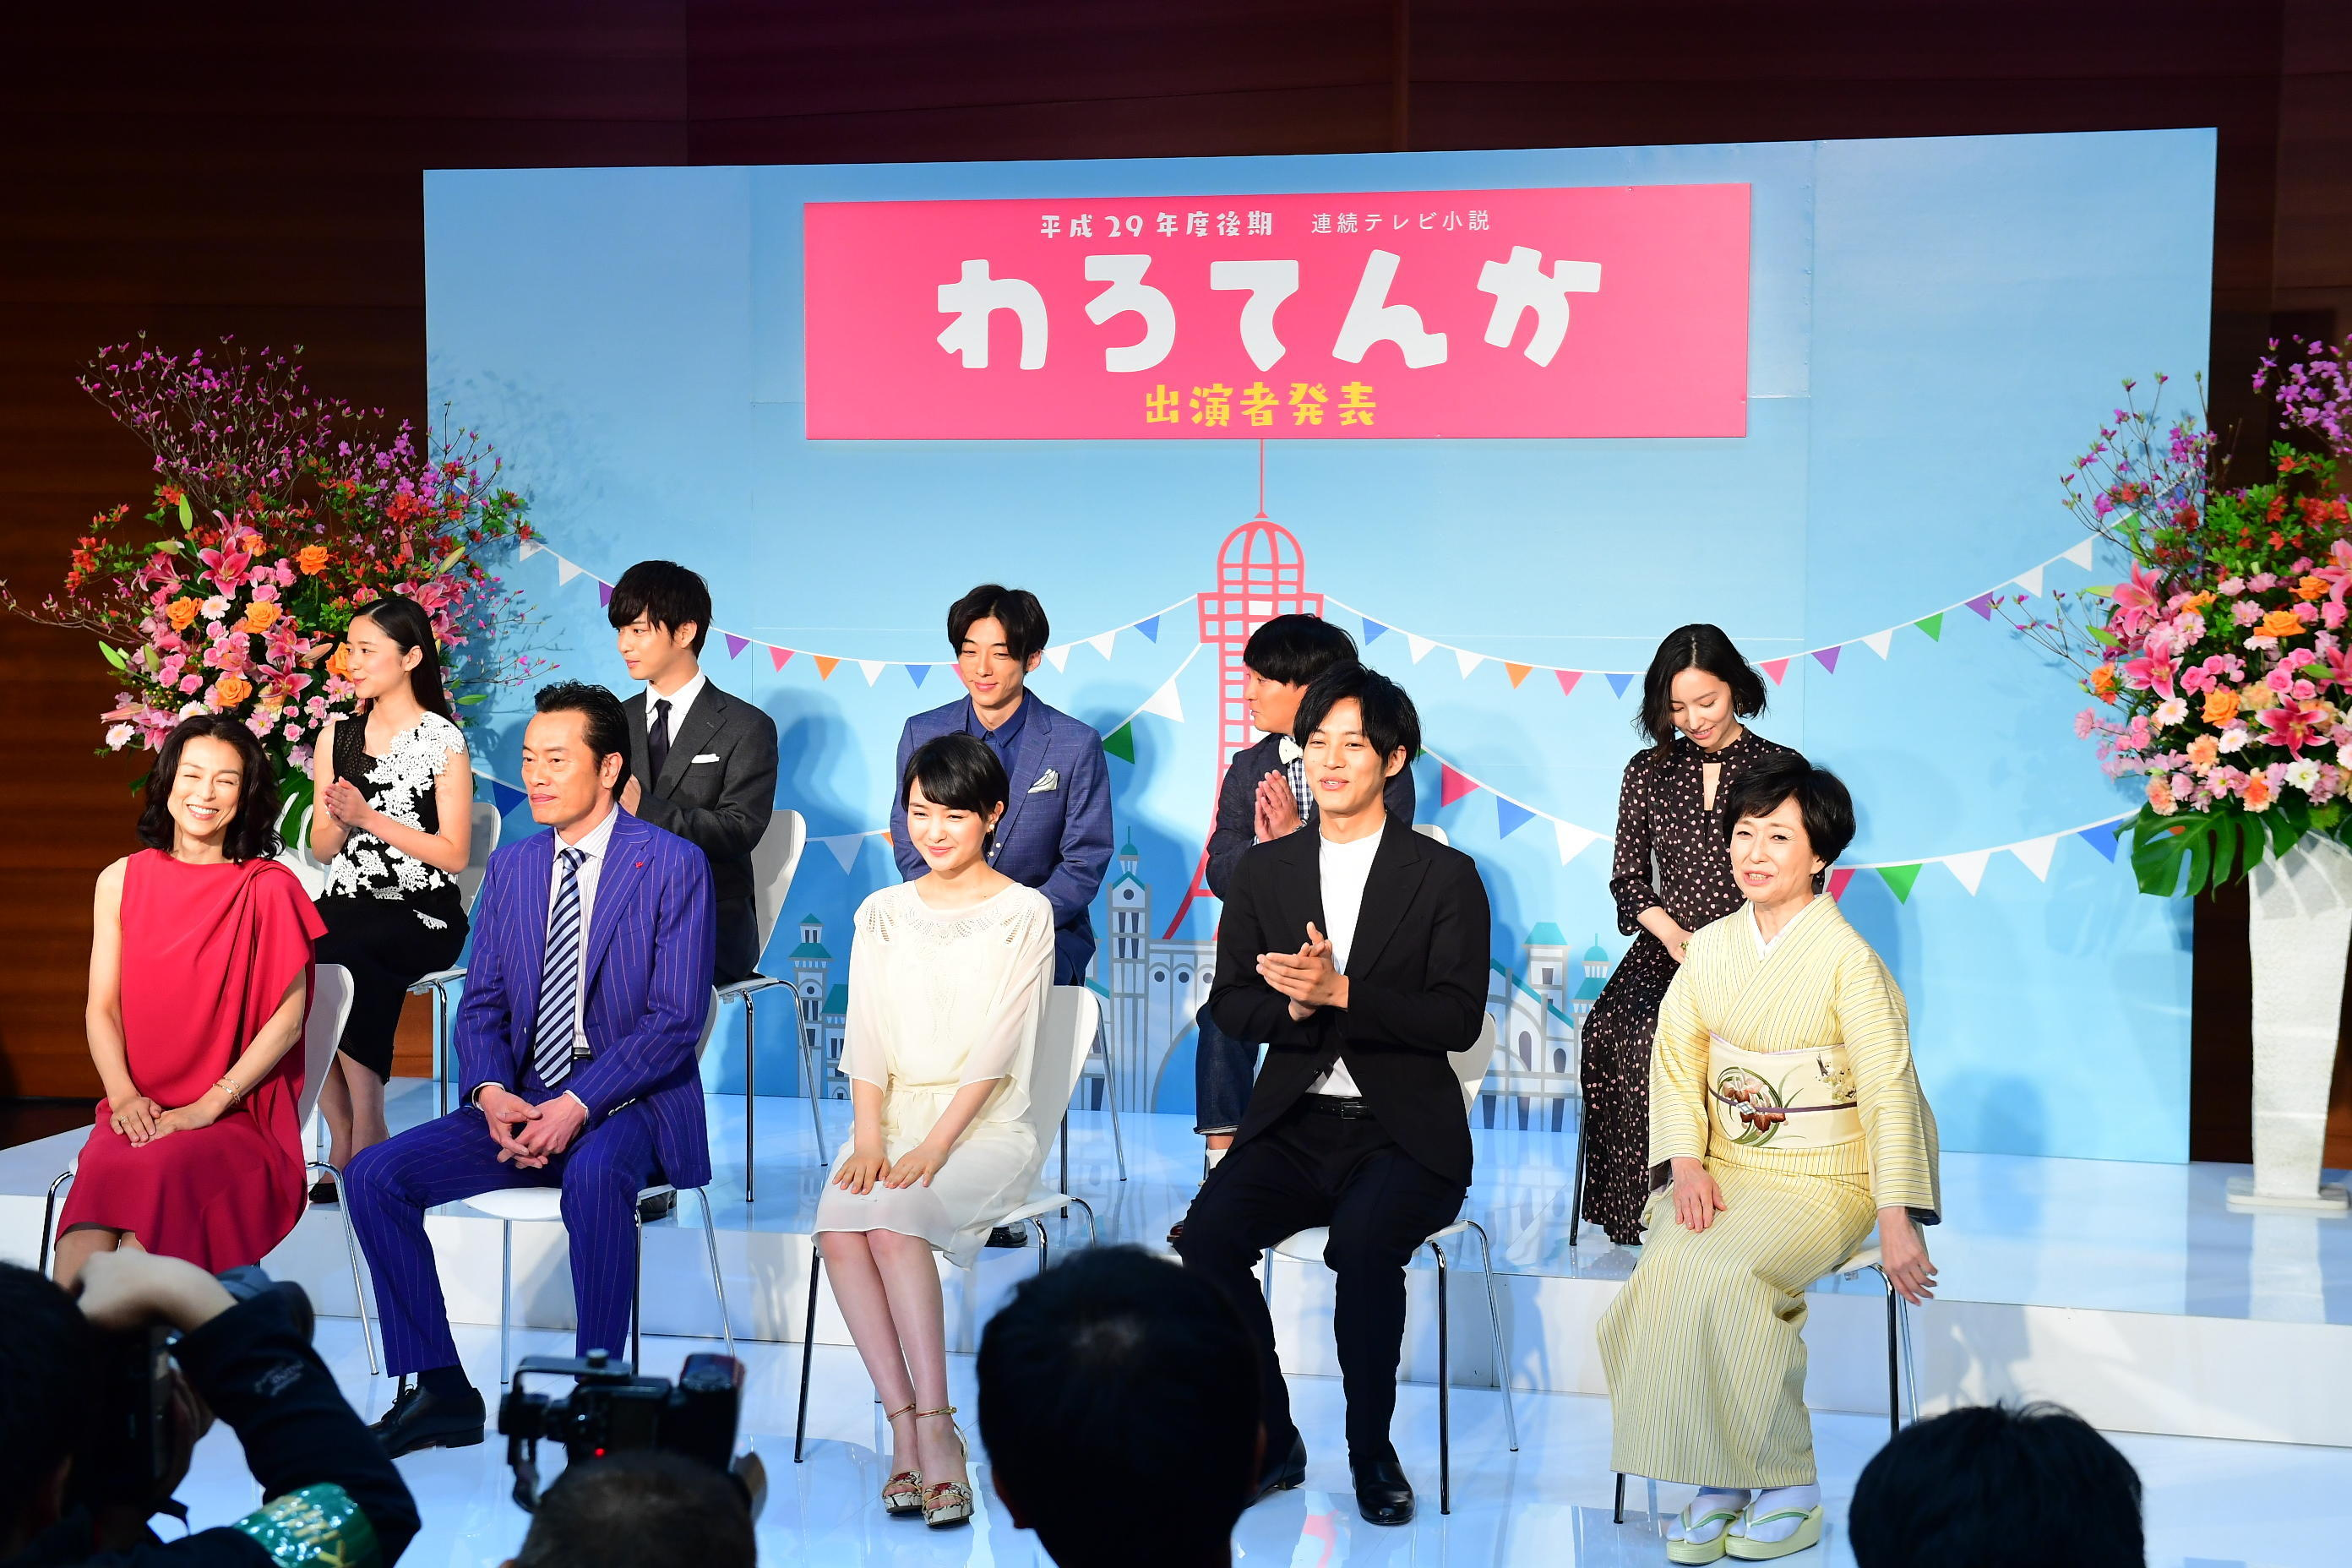 http://news.yoshimoto.co.jp/20170420182847-a6345e6b43f3ea5a9c94ccc9dc24a3933df91c40.jpg